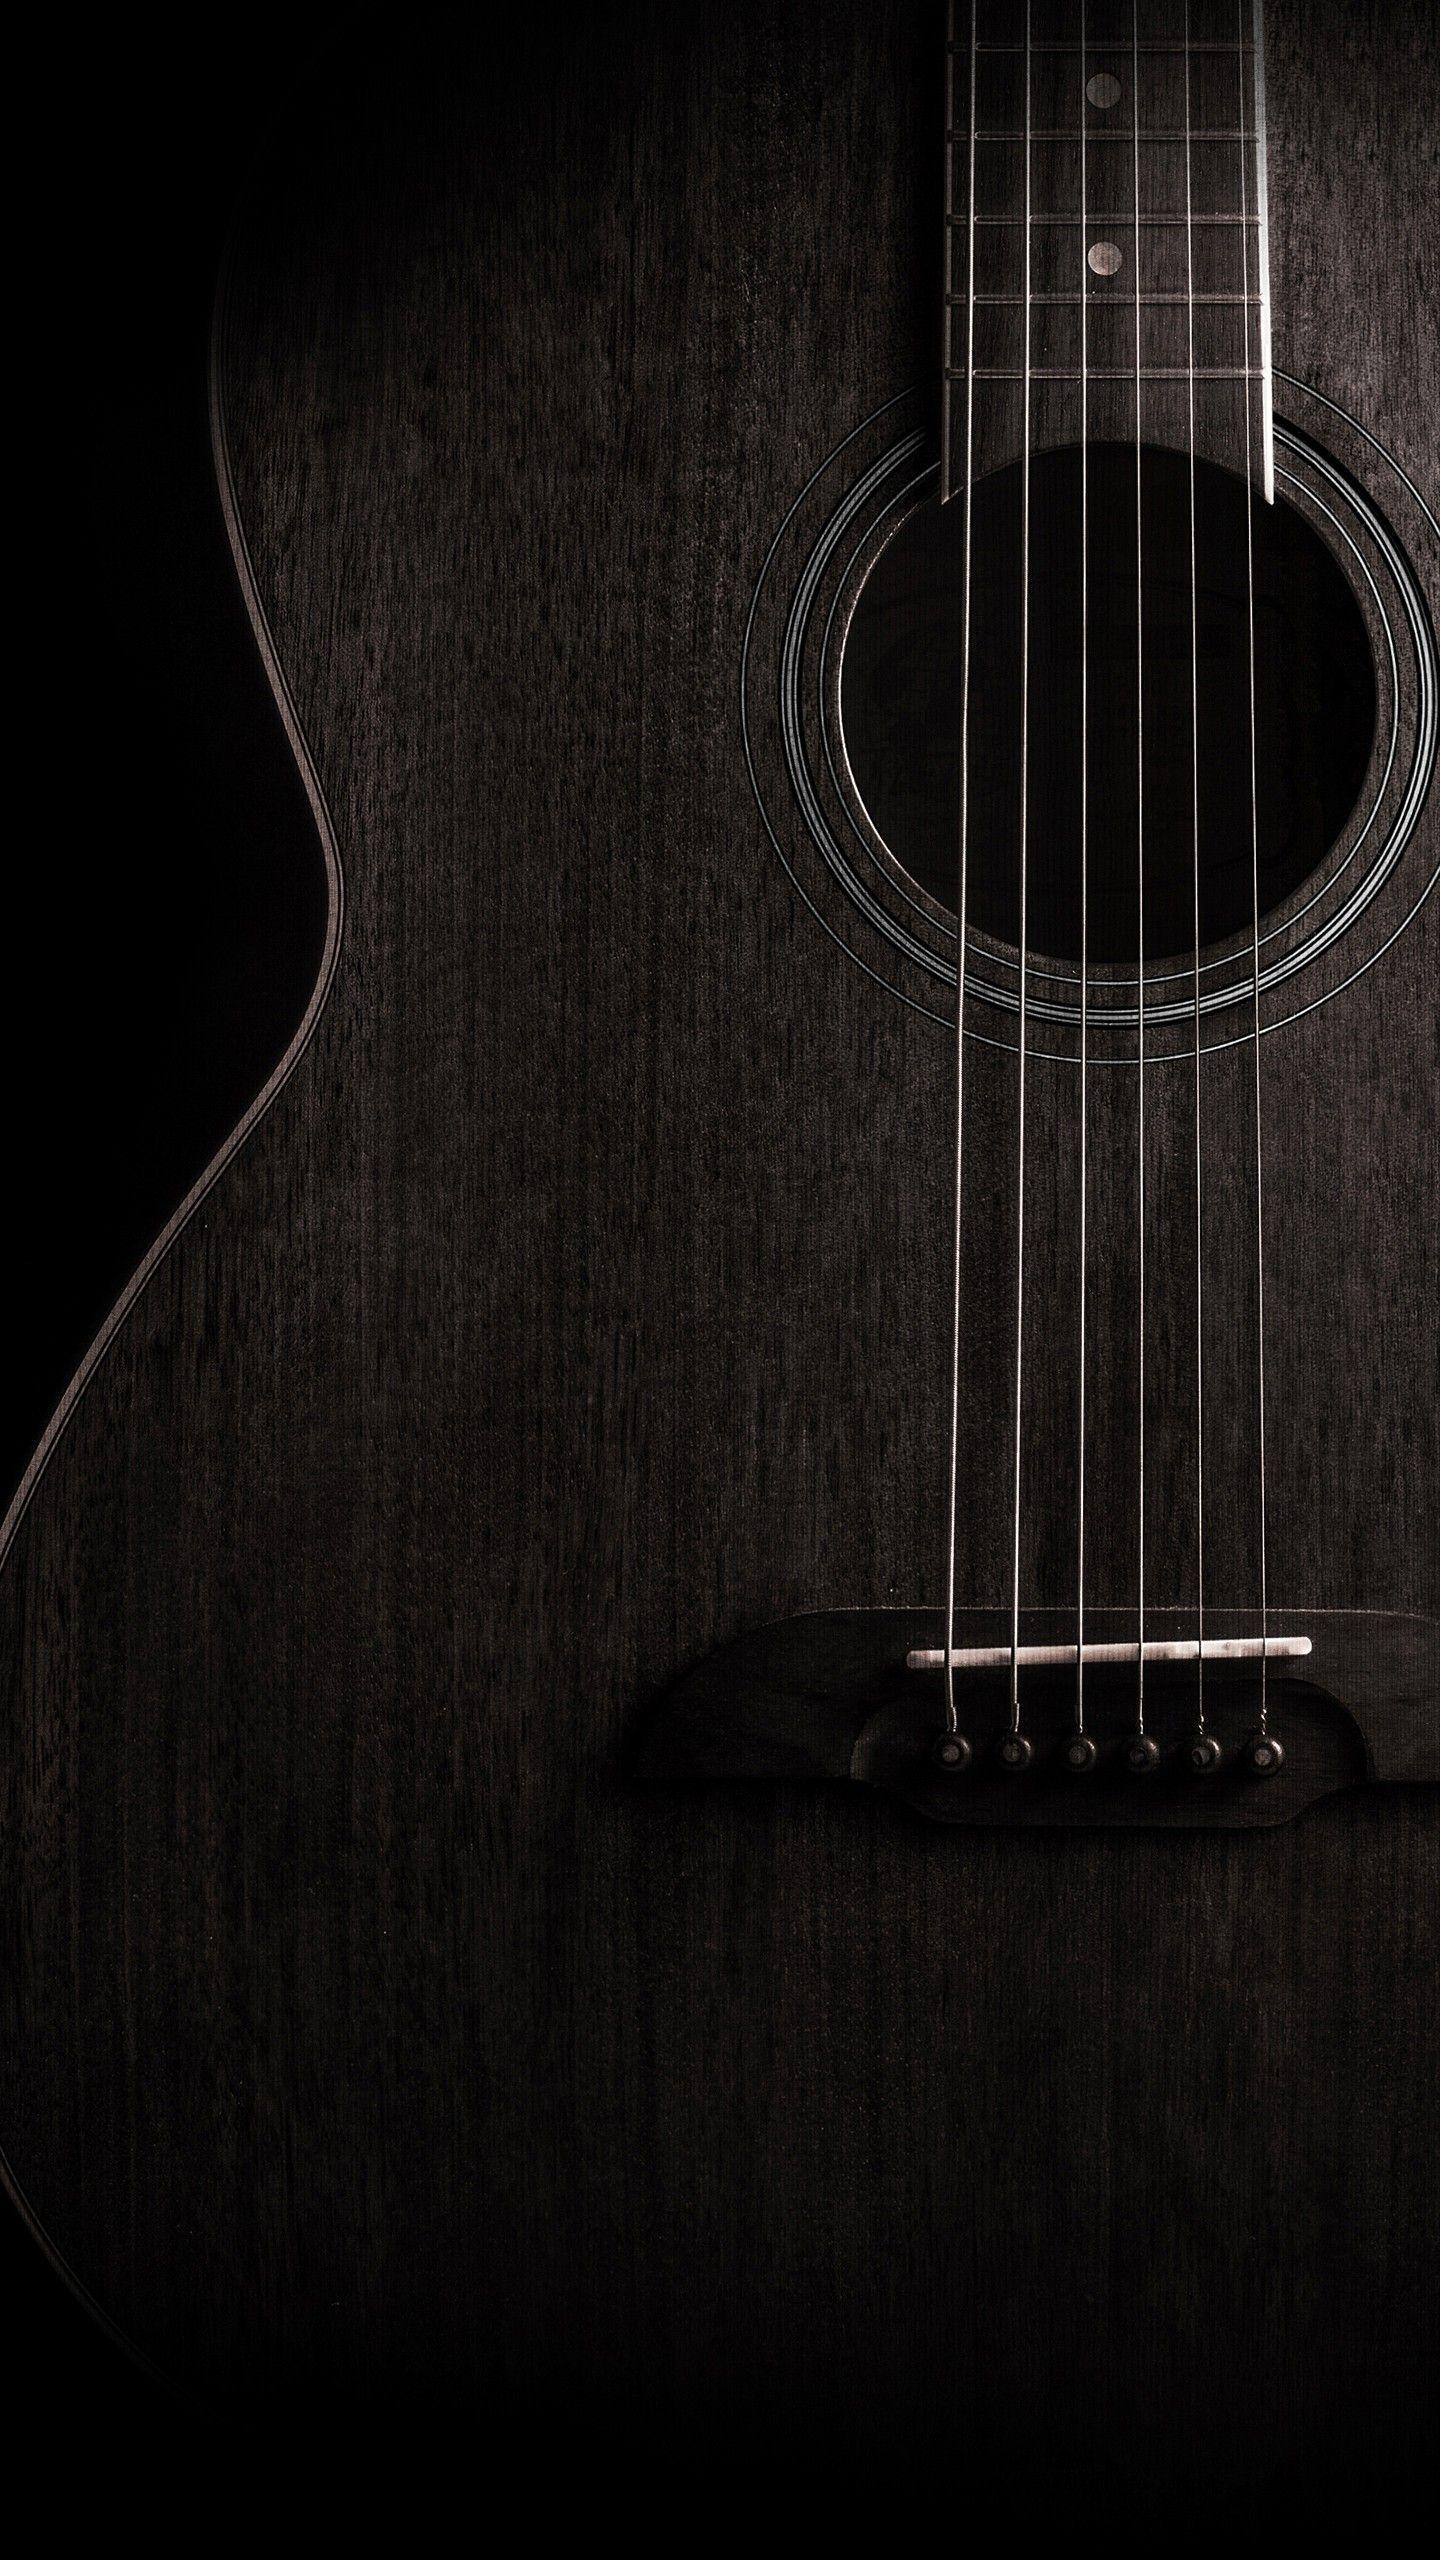 Guitar Iphone Wallpapers Top Free Guitar Iphone Backgrounds Wallpaperaccess